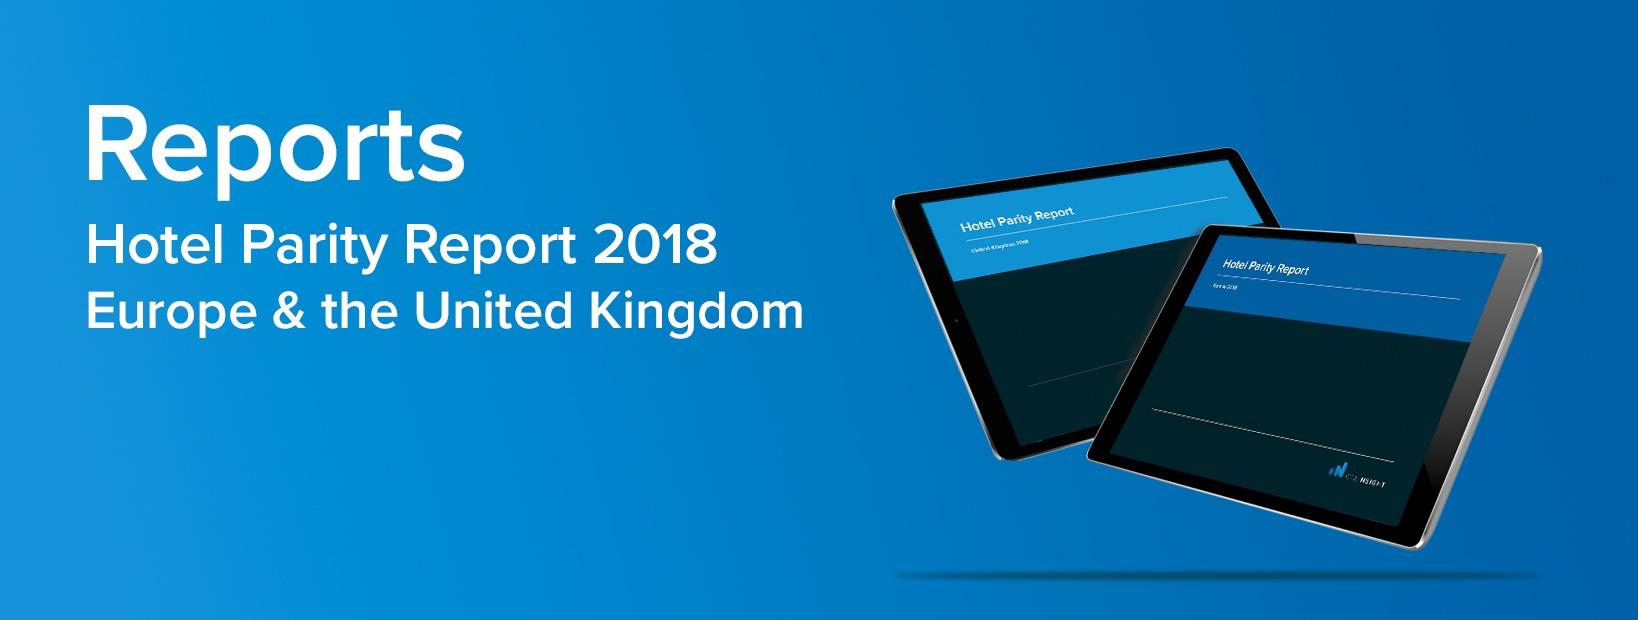 parity-report-2018-q2-Europe-UK-featured-resource